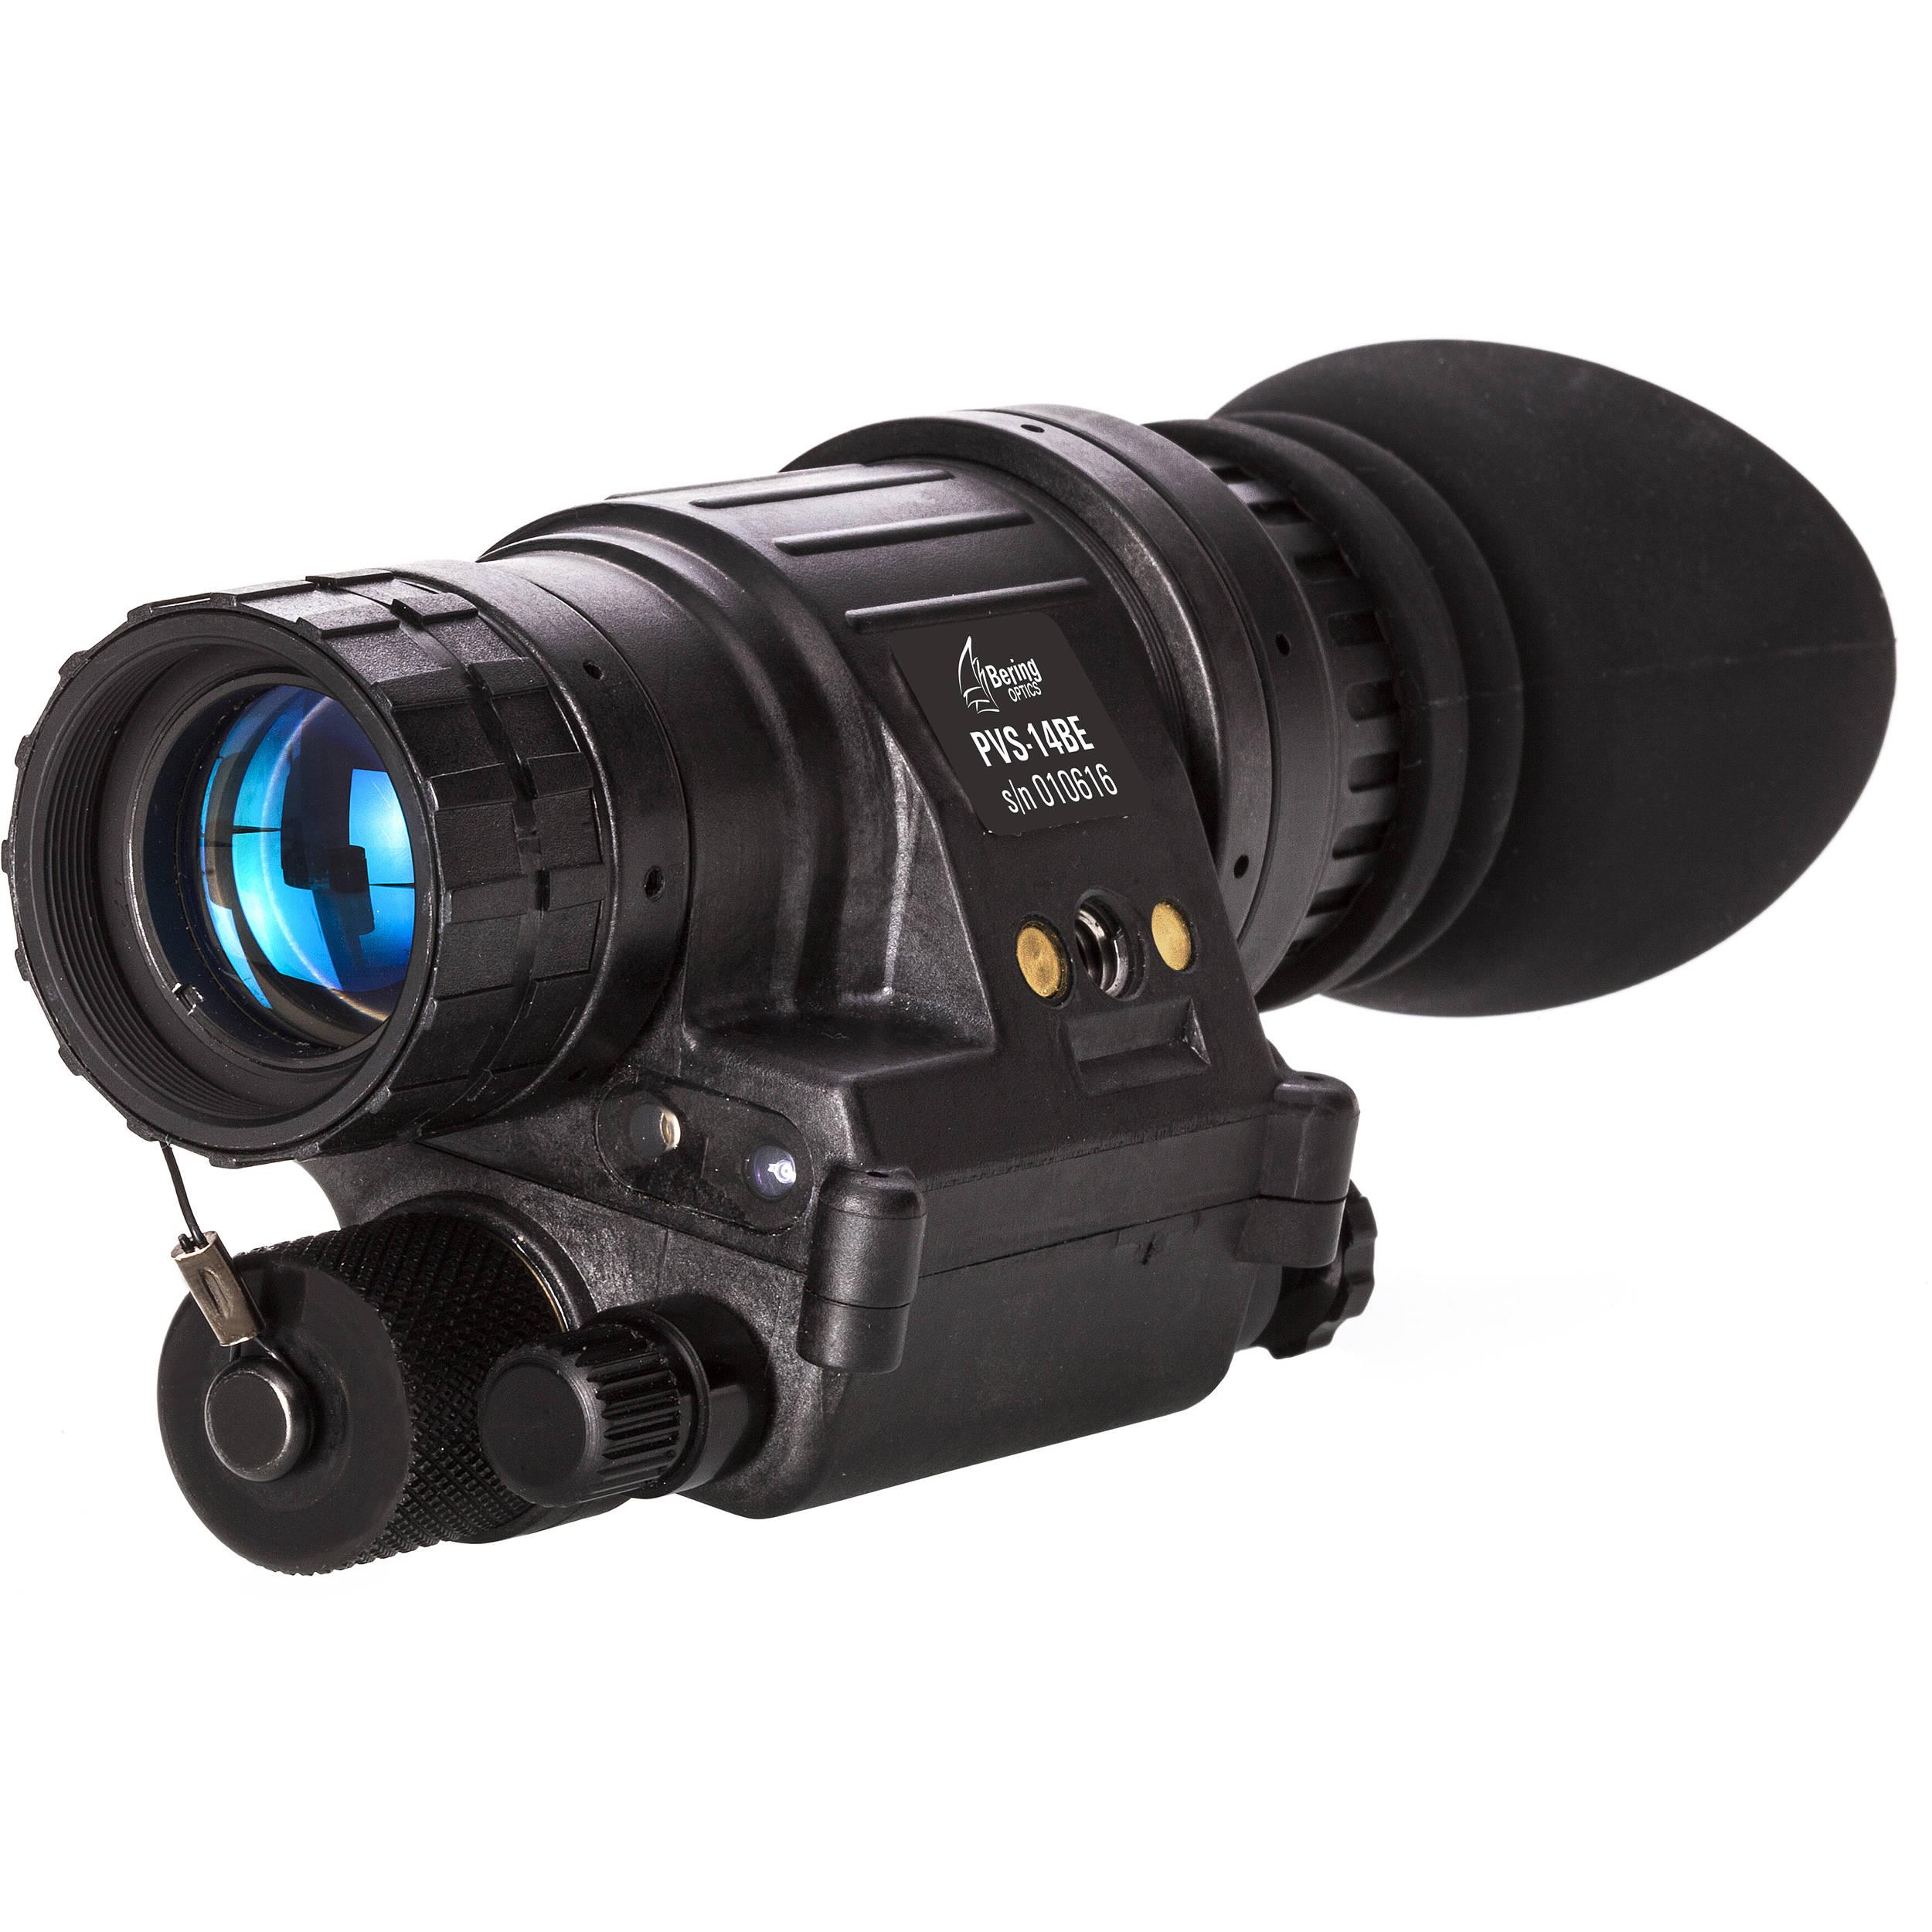 Bering Optics PVS-14BE Elite 1x 3rd Gen NV Monocular & Headgear Kit (Matte  Black)